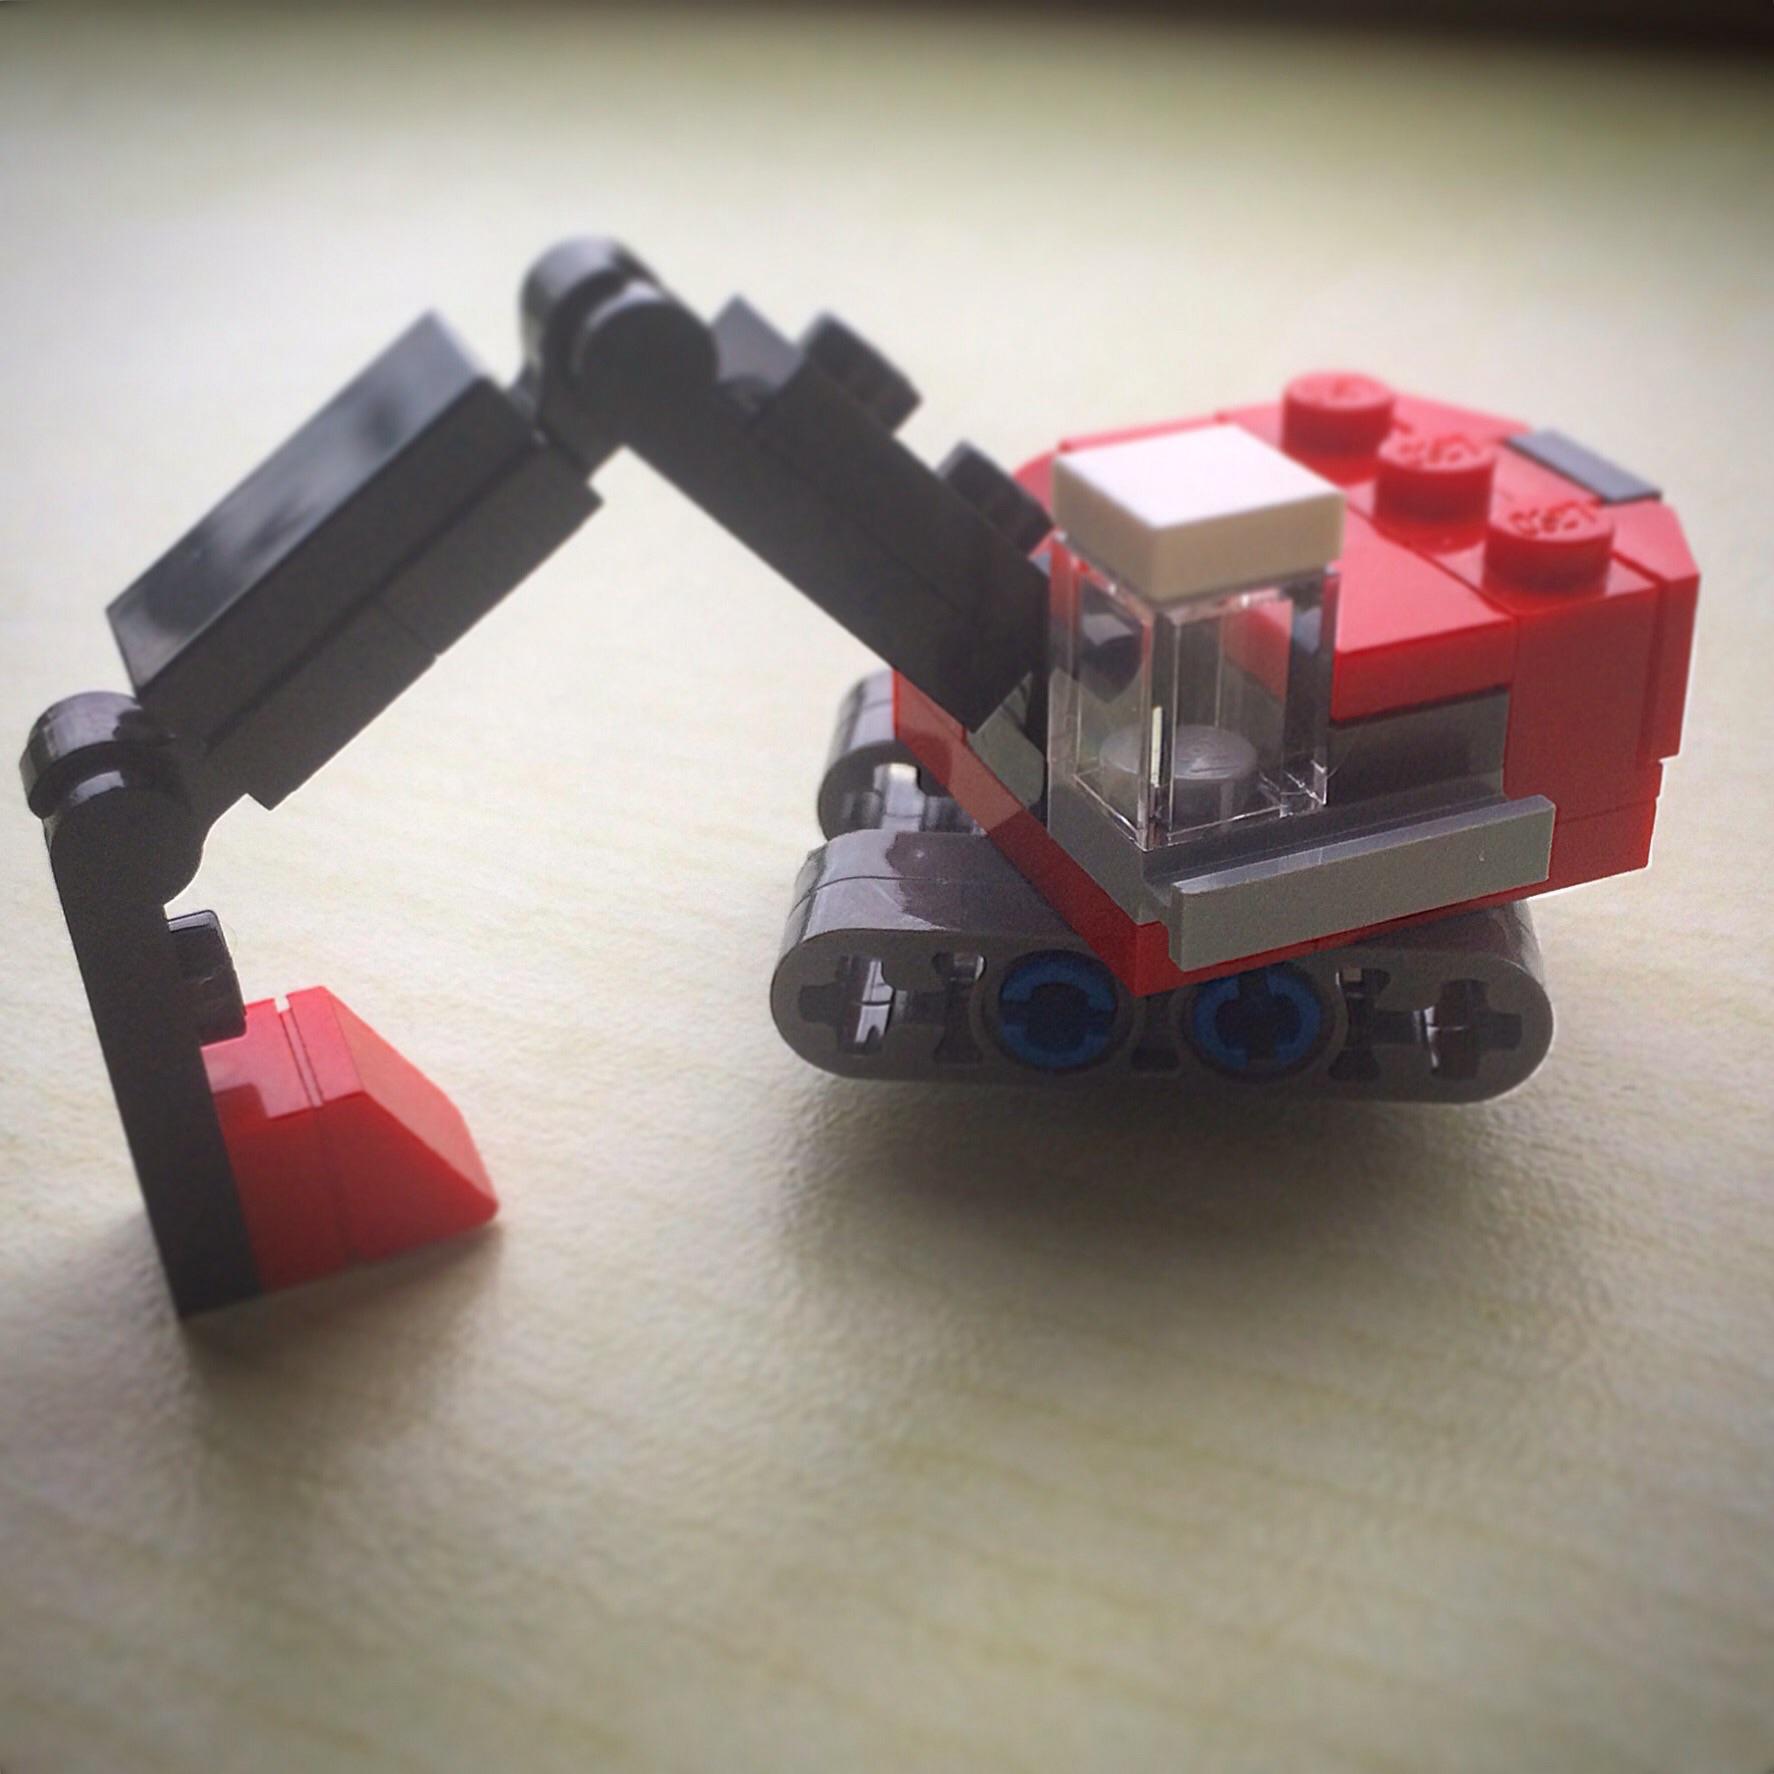 LEGO Microscale digger